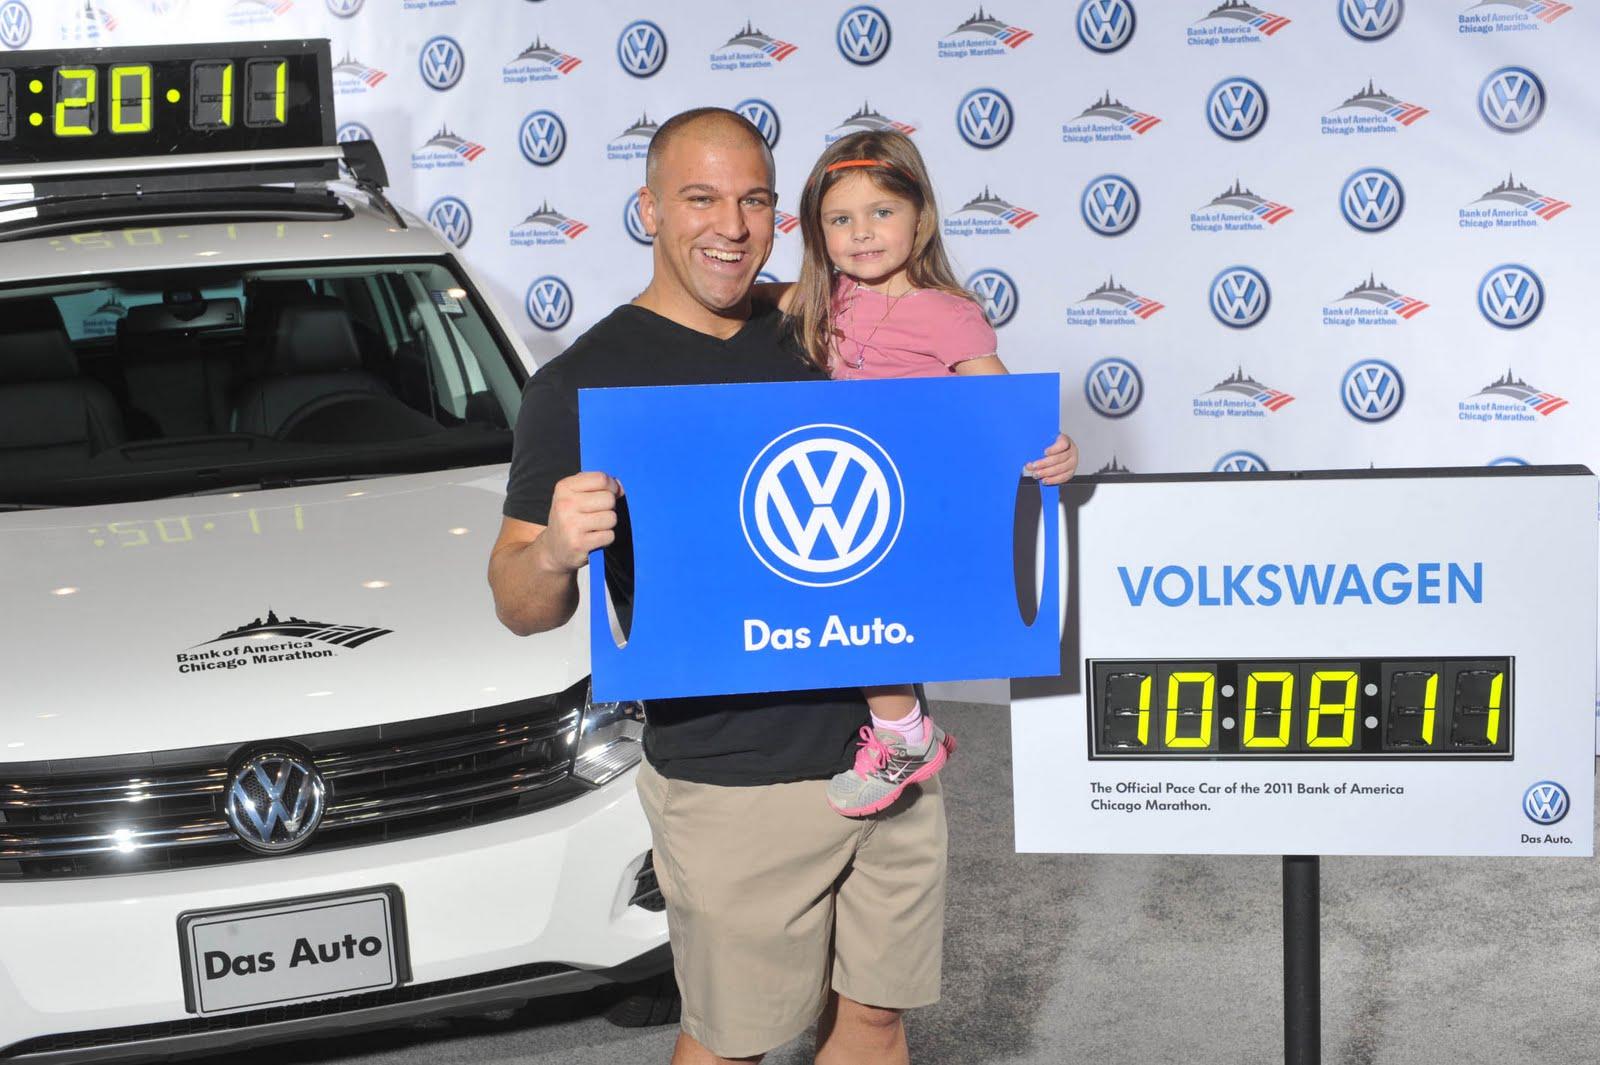 VW Dealer Chicago >> Fab Photo Blog 10 6 11 10 8 11 Onsite Instant Prints For